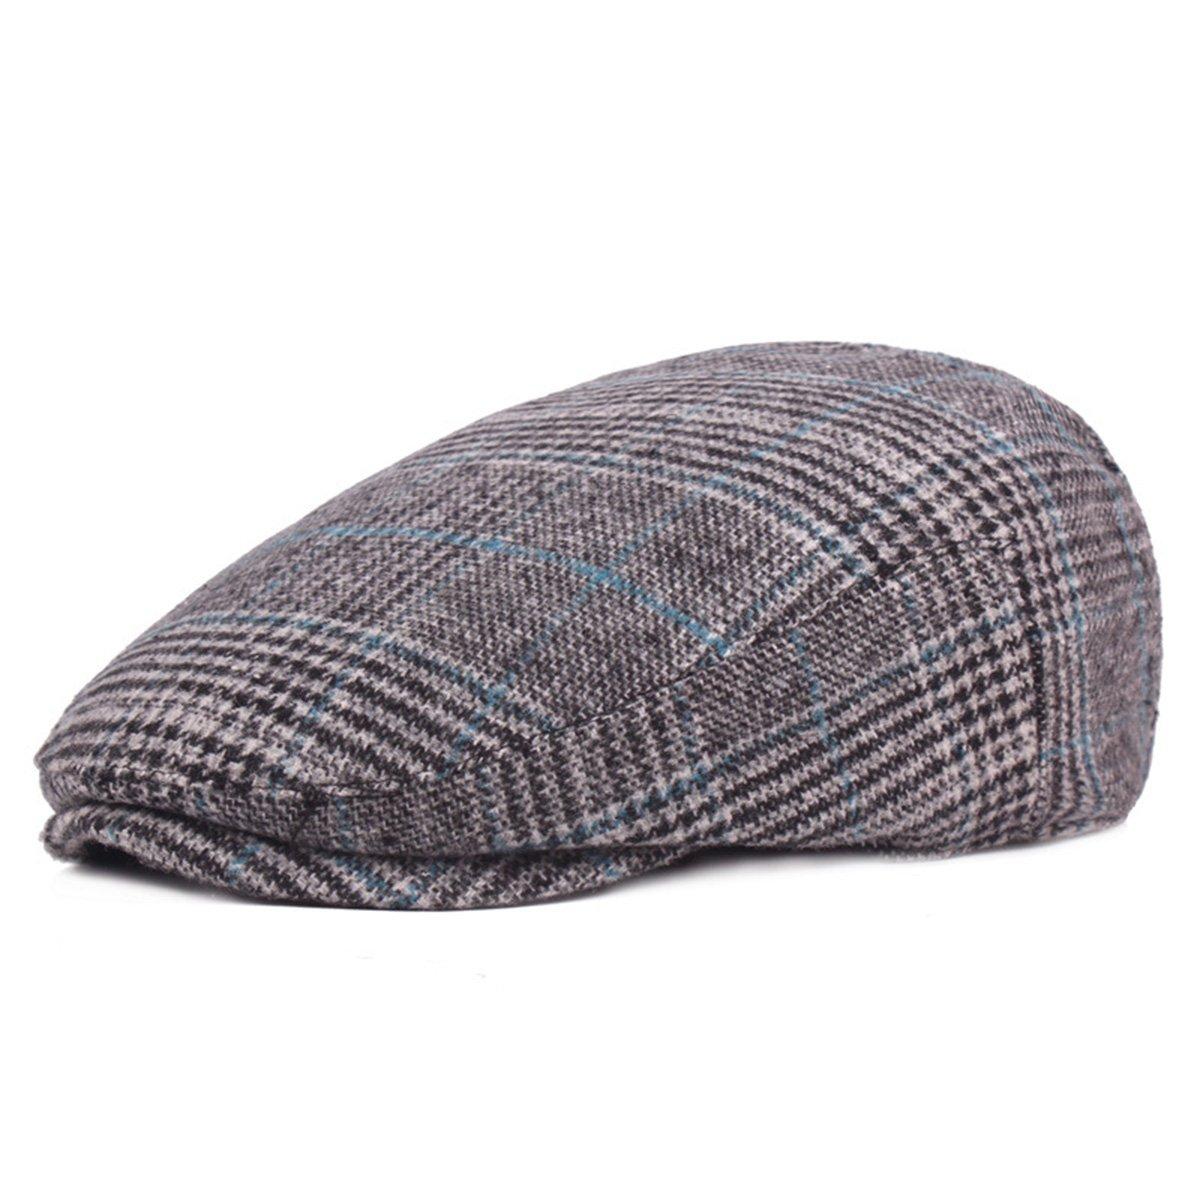 ef2b0249a ZLSLZ Mens Woolen Plaid Flat Ivy Newsboy Cabbie Gatsby Paperboy Hats Caps  for Men